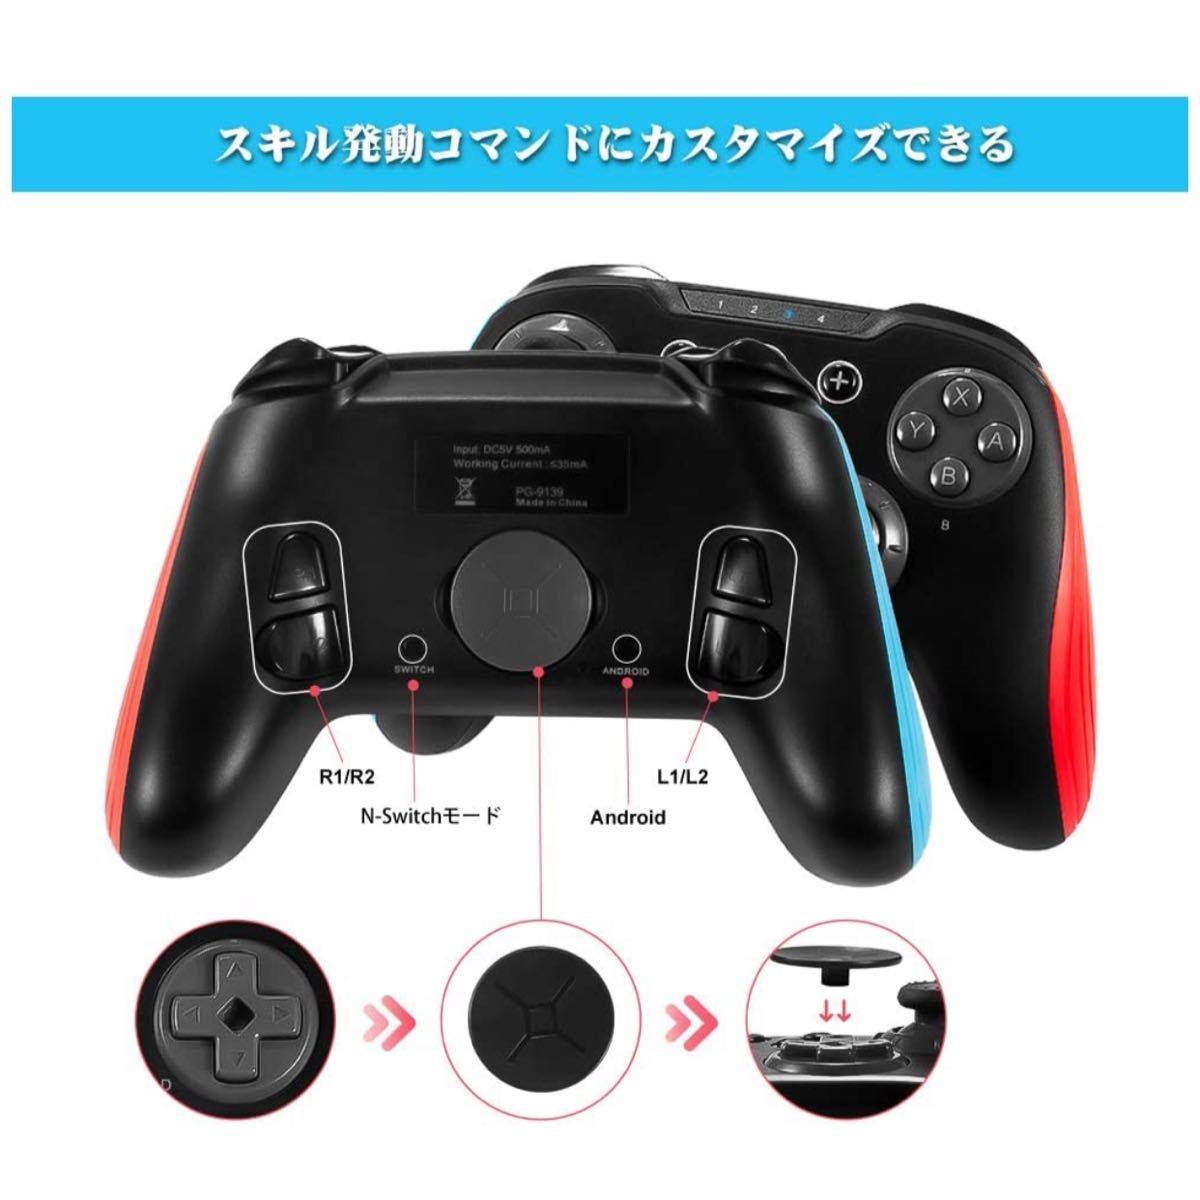 Switch ワイヤレス ゲームコントローラー Bluetooth 接続 無線